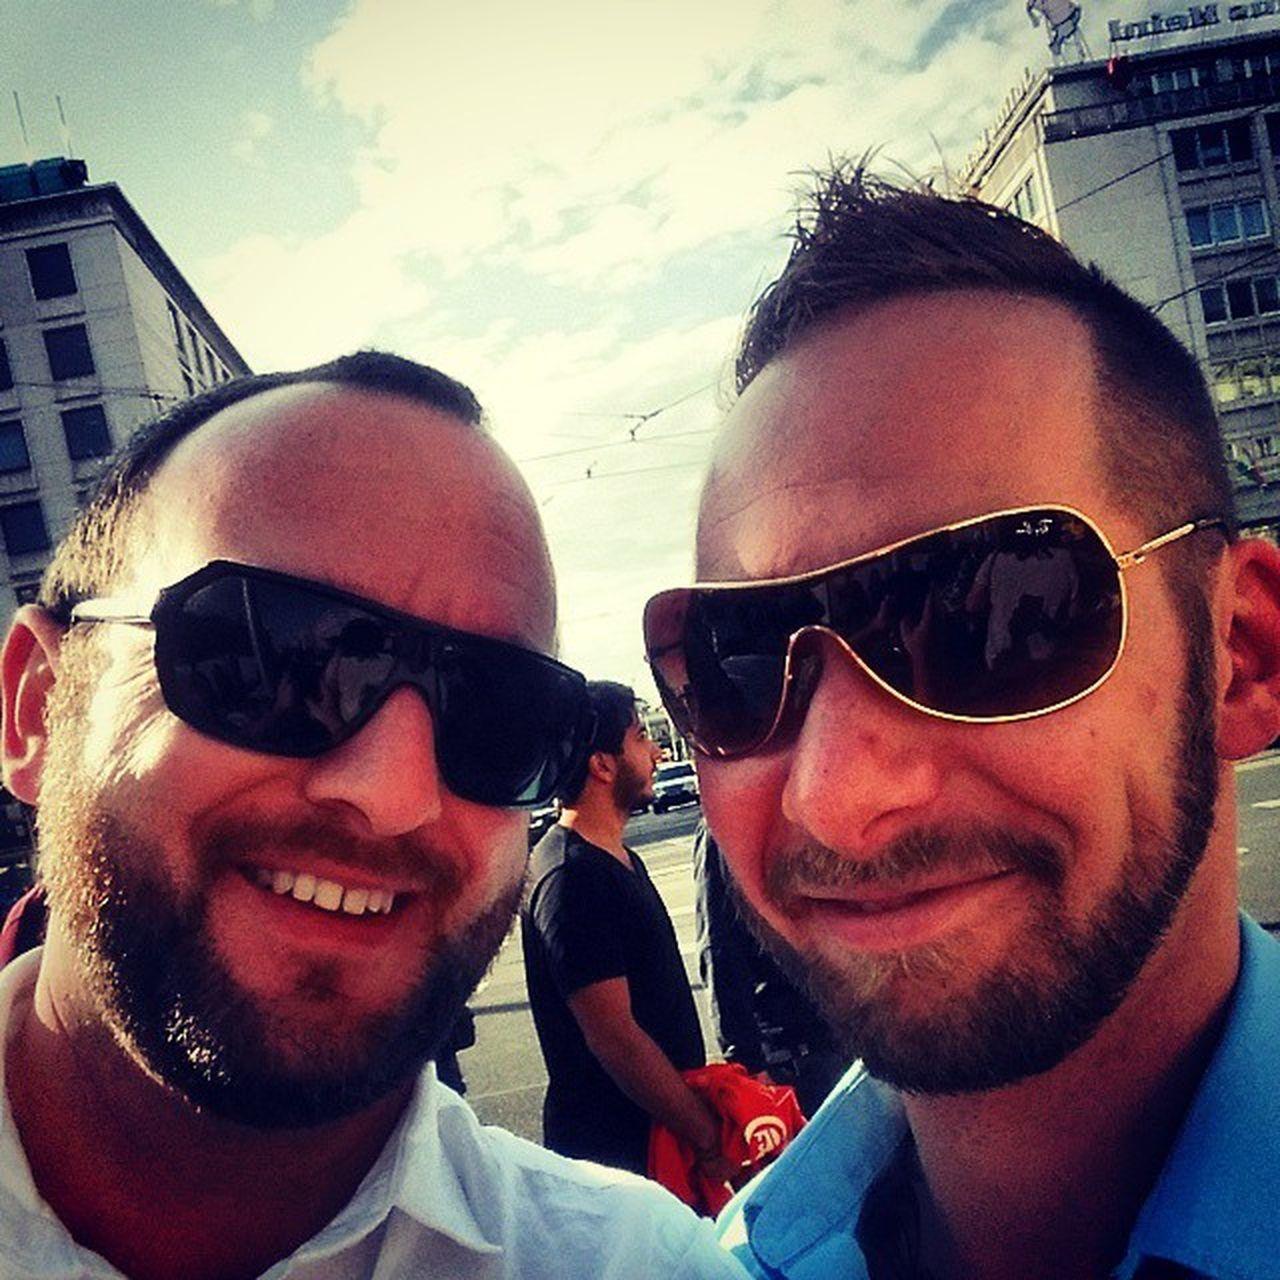 Beardedorginal Thebeardedhomo Thebeardedmancompany Gayboys vienna